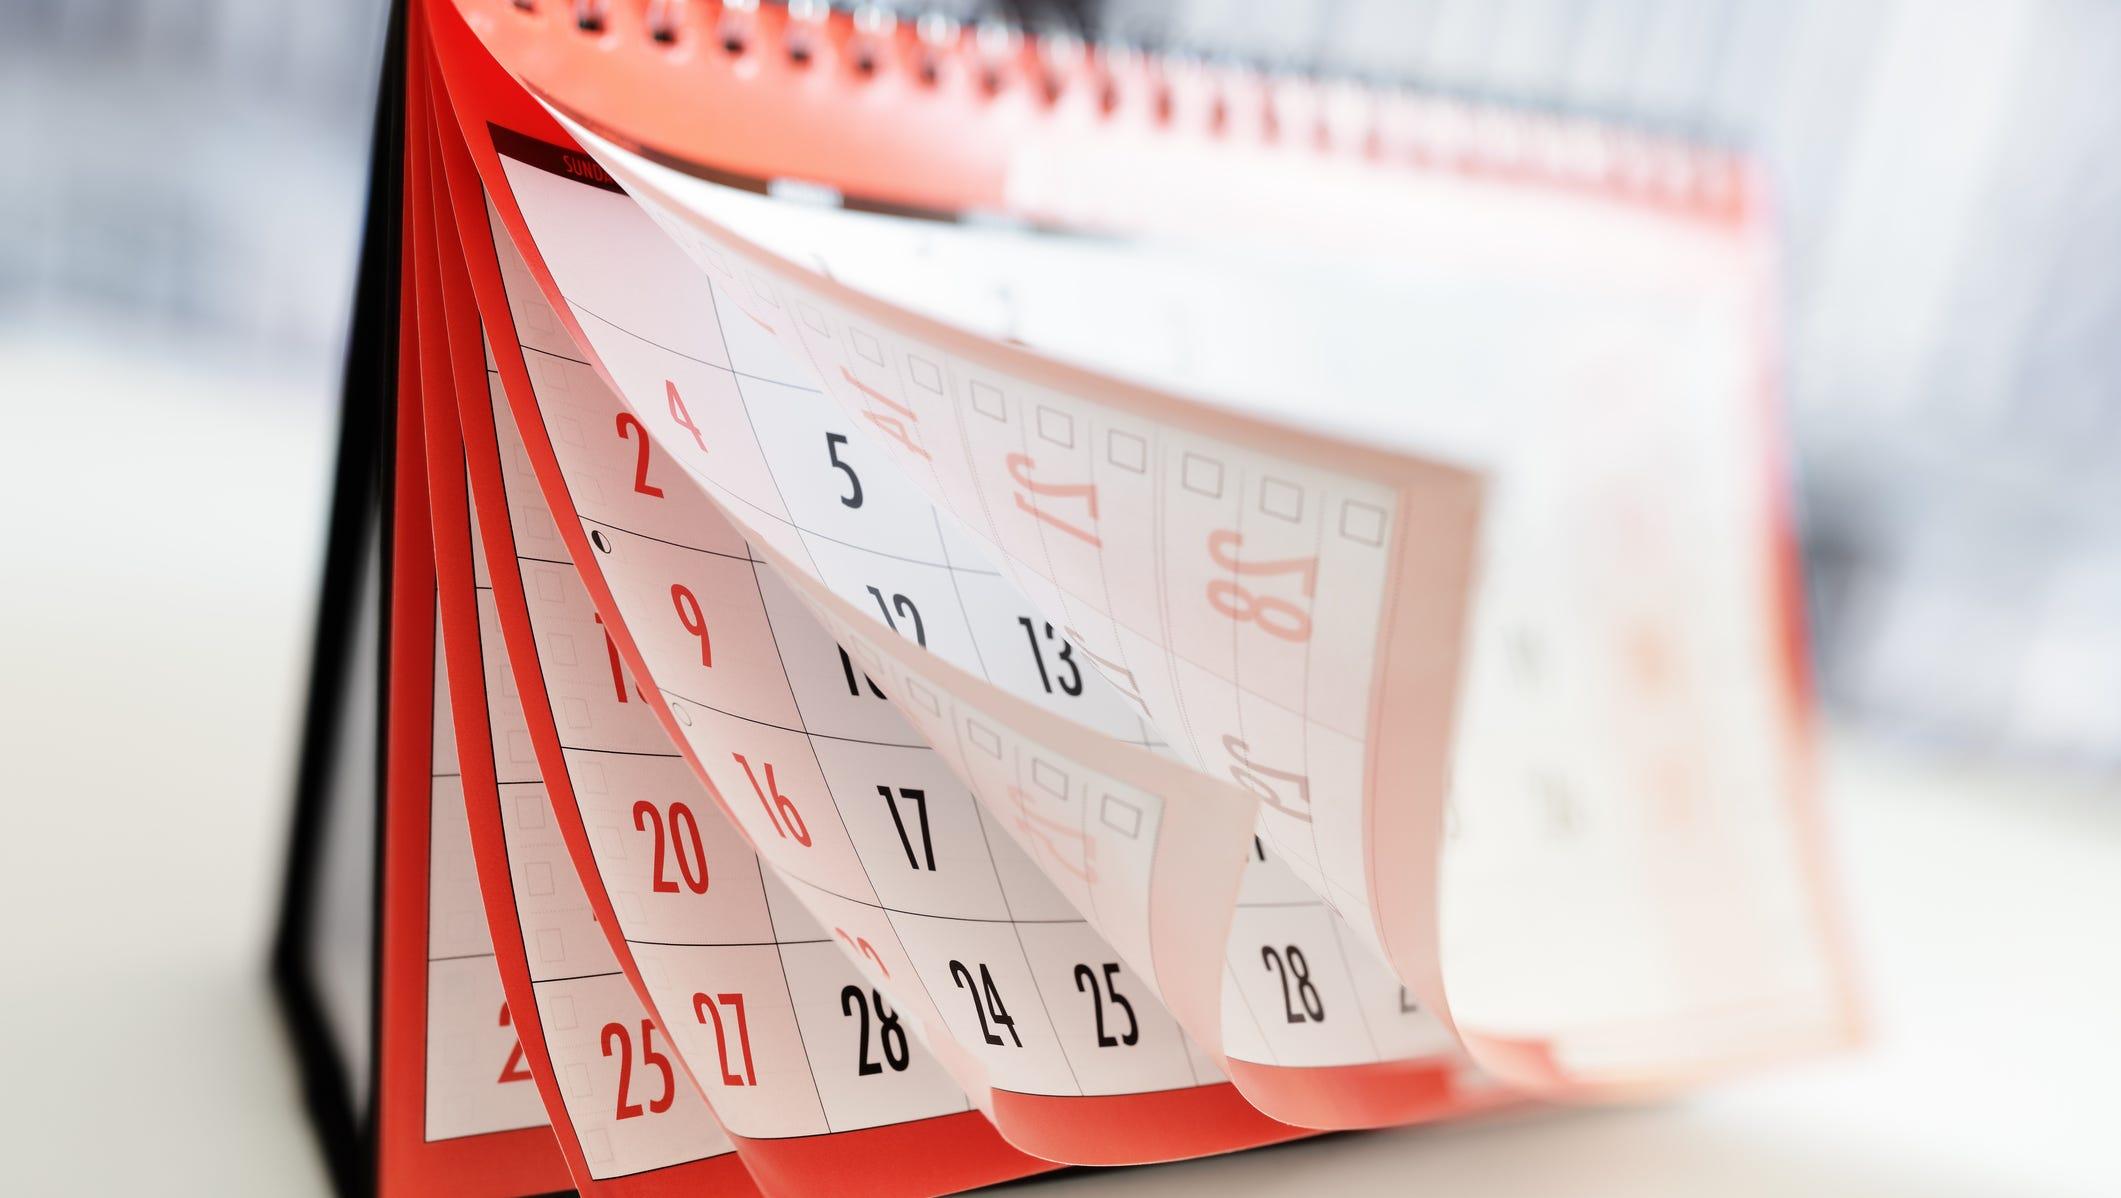 Ccps Calendar 2022 23.Collier County School Calendar 2022 23 Calendar Approved By School Board